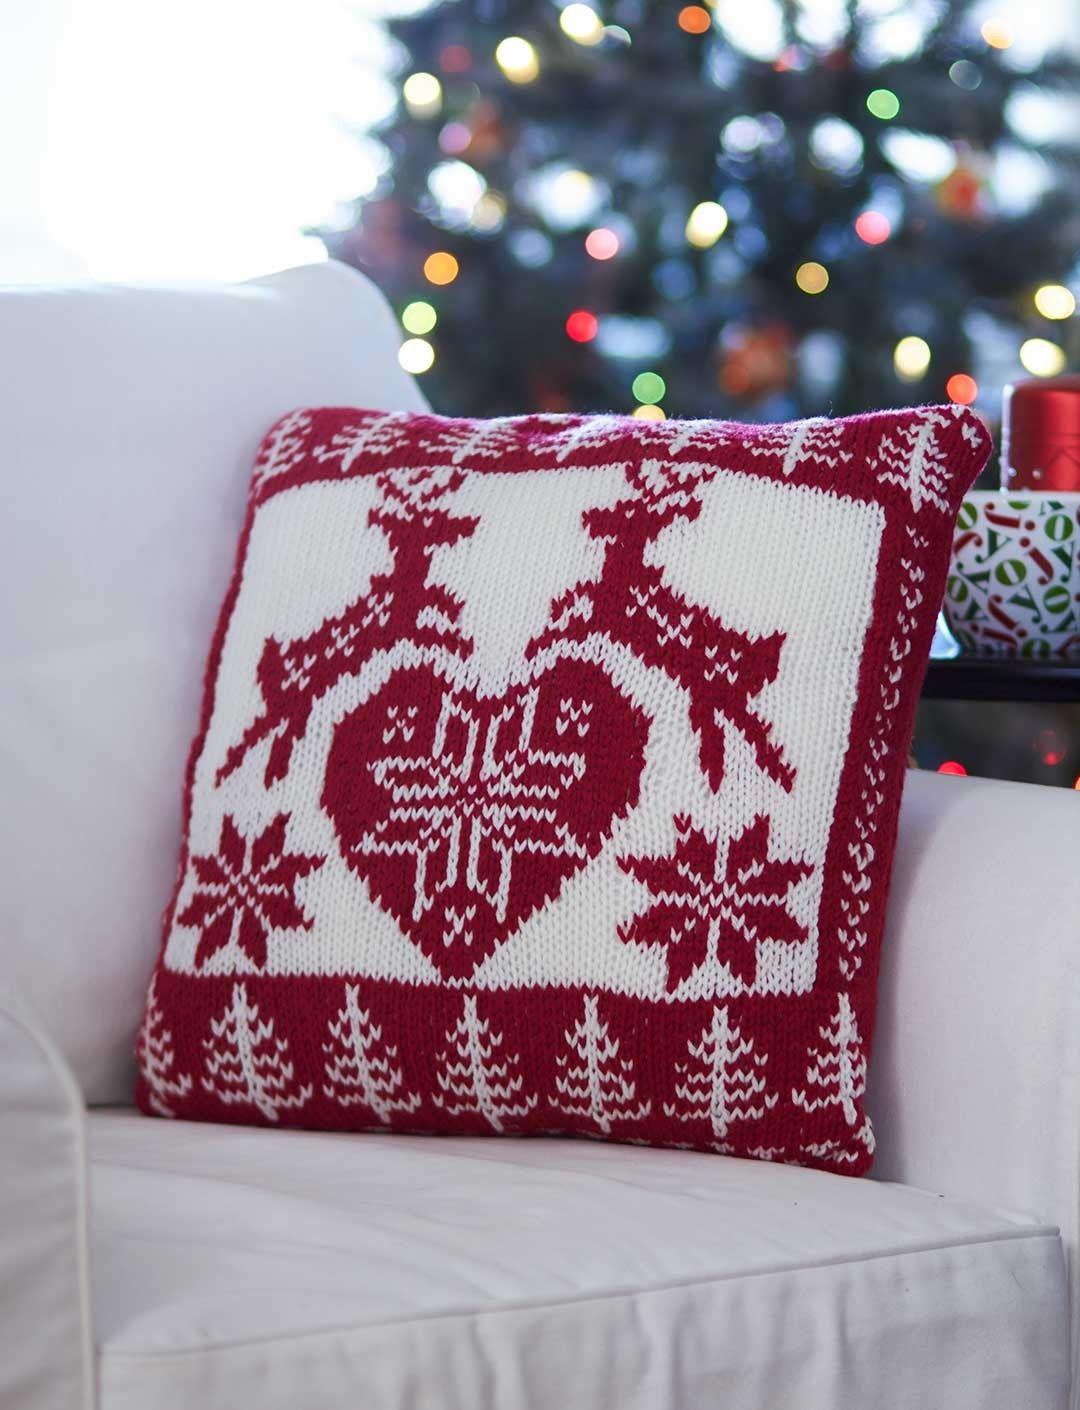 Nordic Holiday Pillow - Free Pattern | Yarnspirations | Knit happens ...